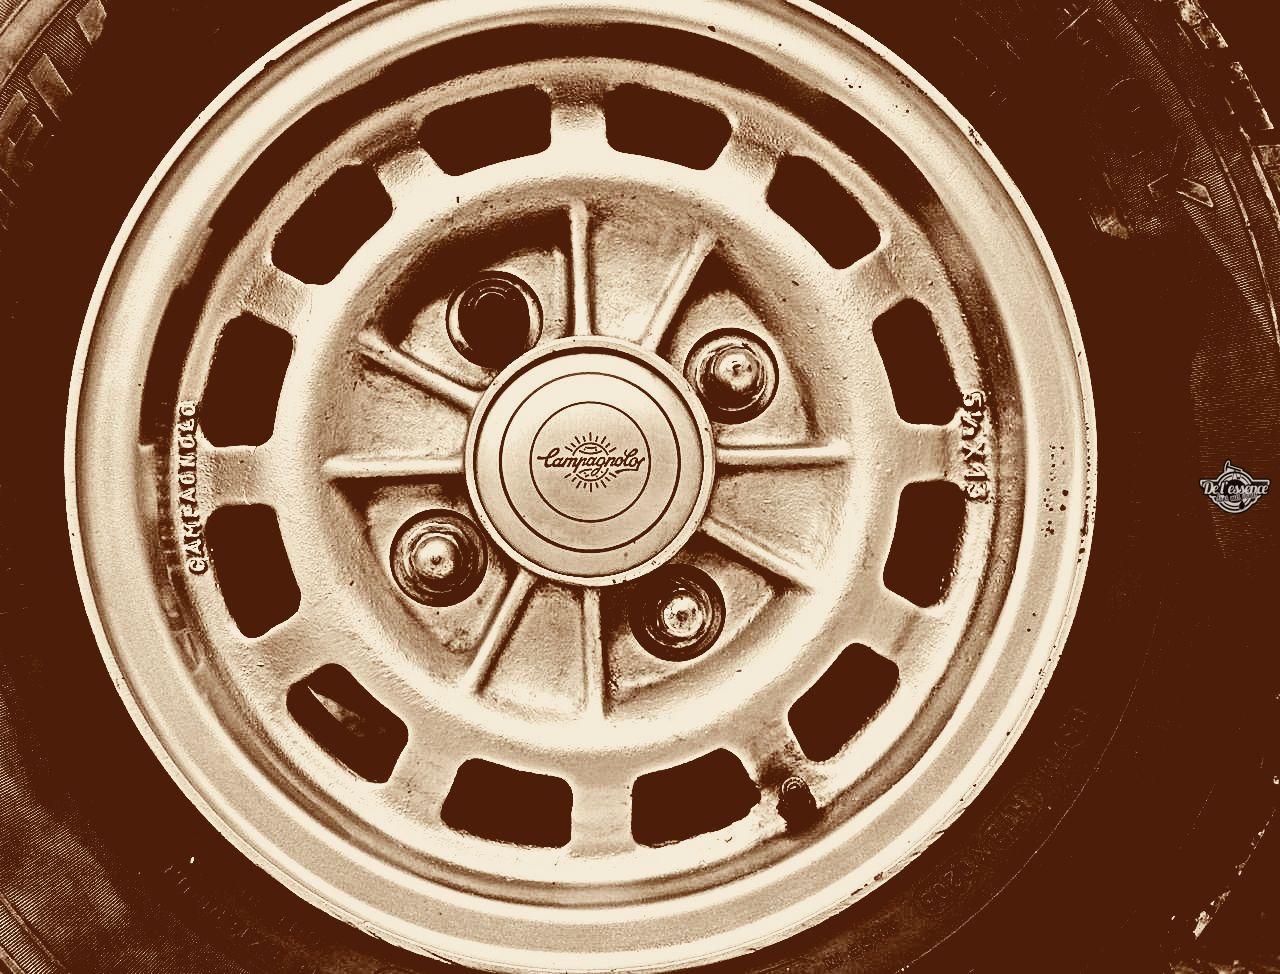 Lancia Fulvia HF Fanalone - Belissima leggenda ! 117